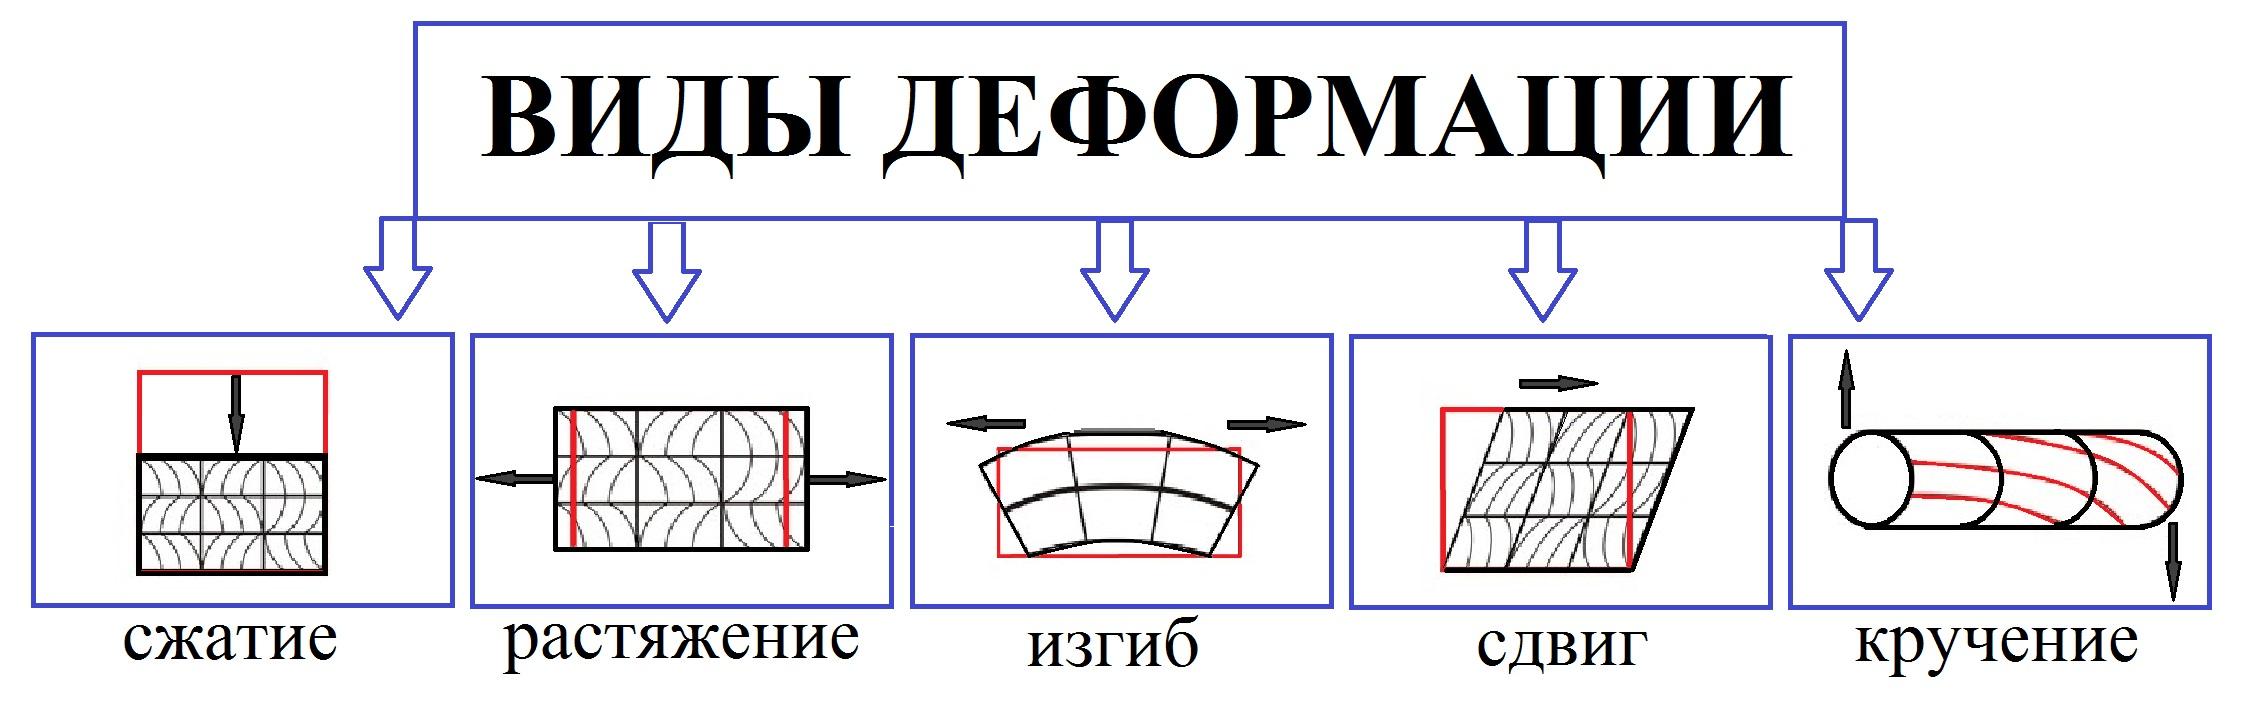 Деформация сдвига схема